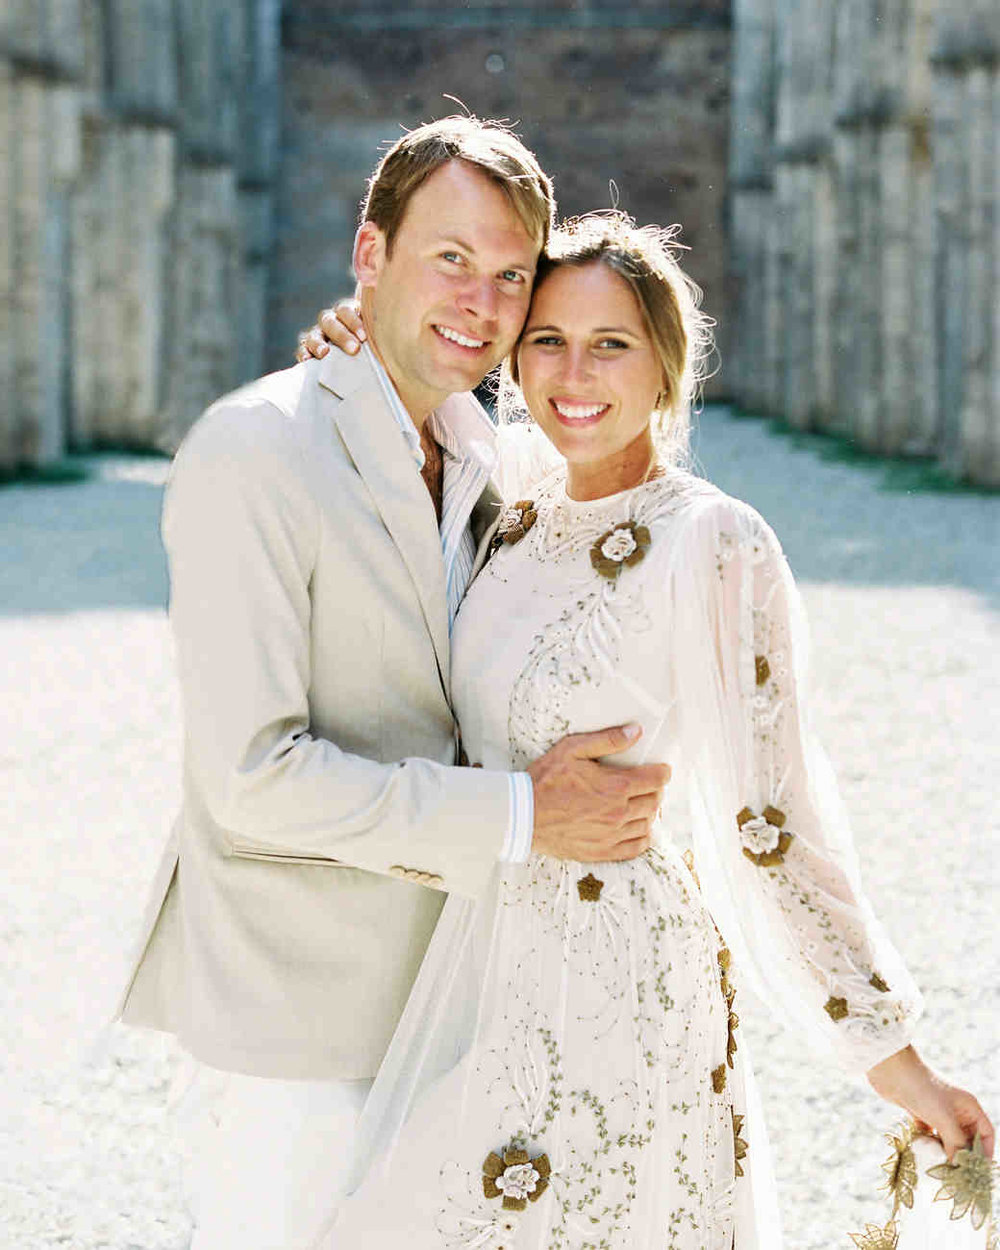 alexis-zach-wedding-italy-couple-12800_06-6419608-1117_vert.jpg